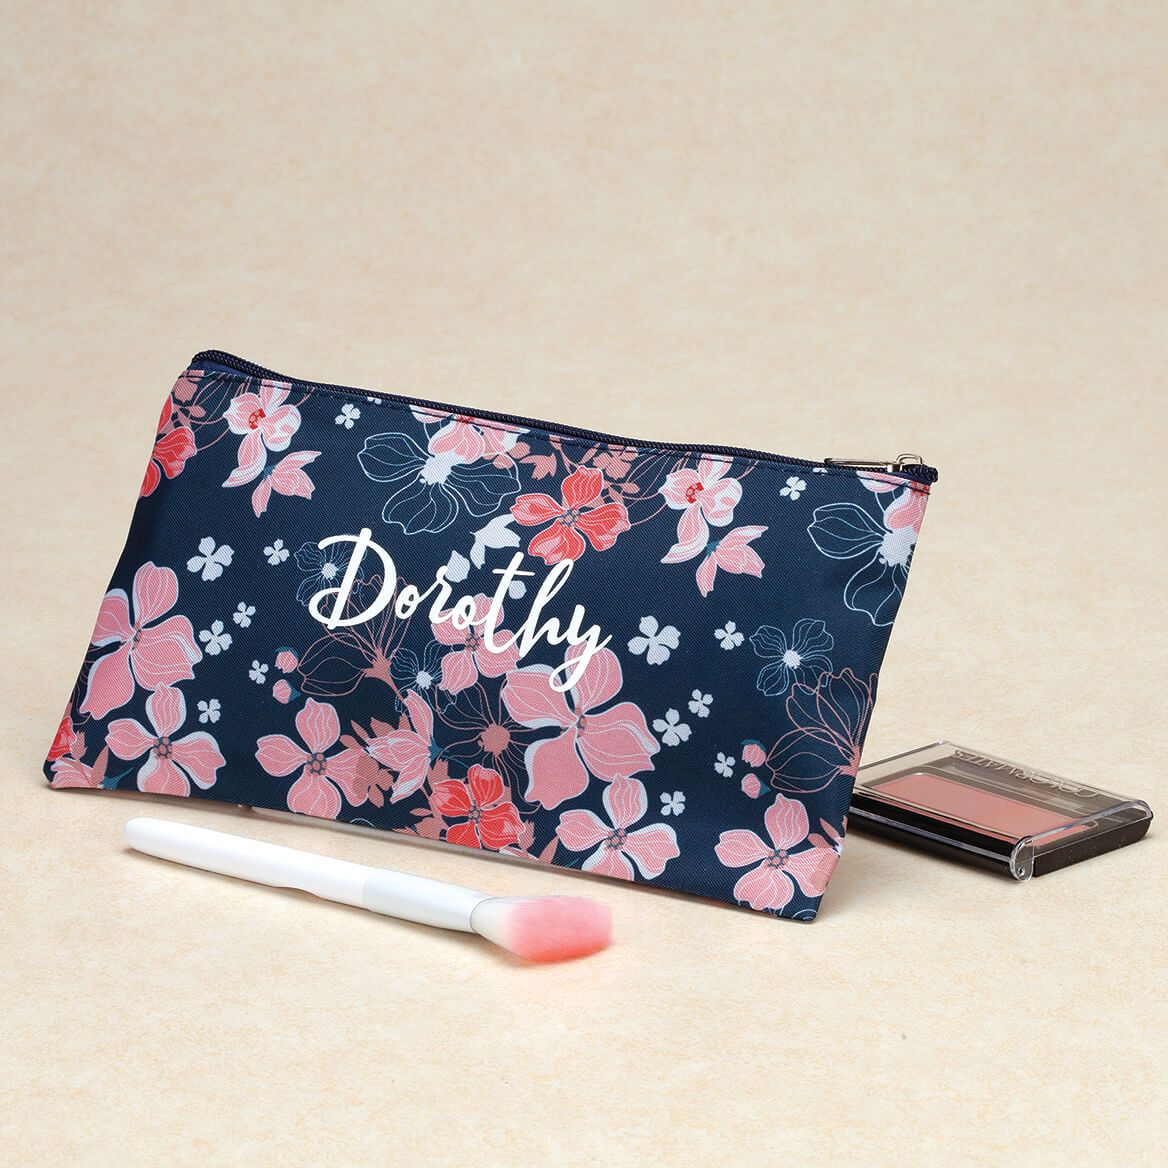 Personalized Makeup & Pencil Pouch-370524